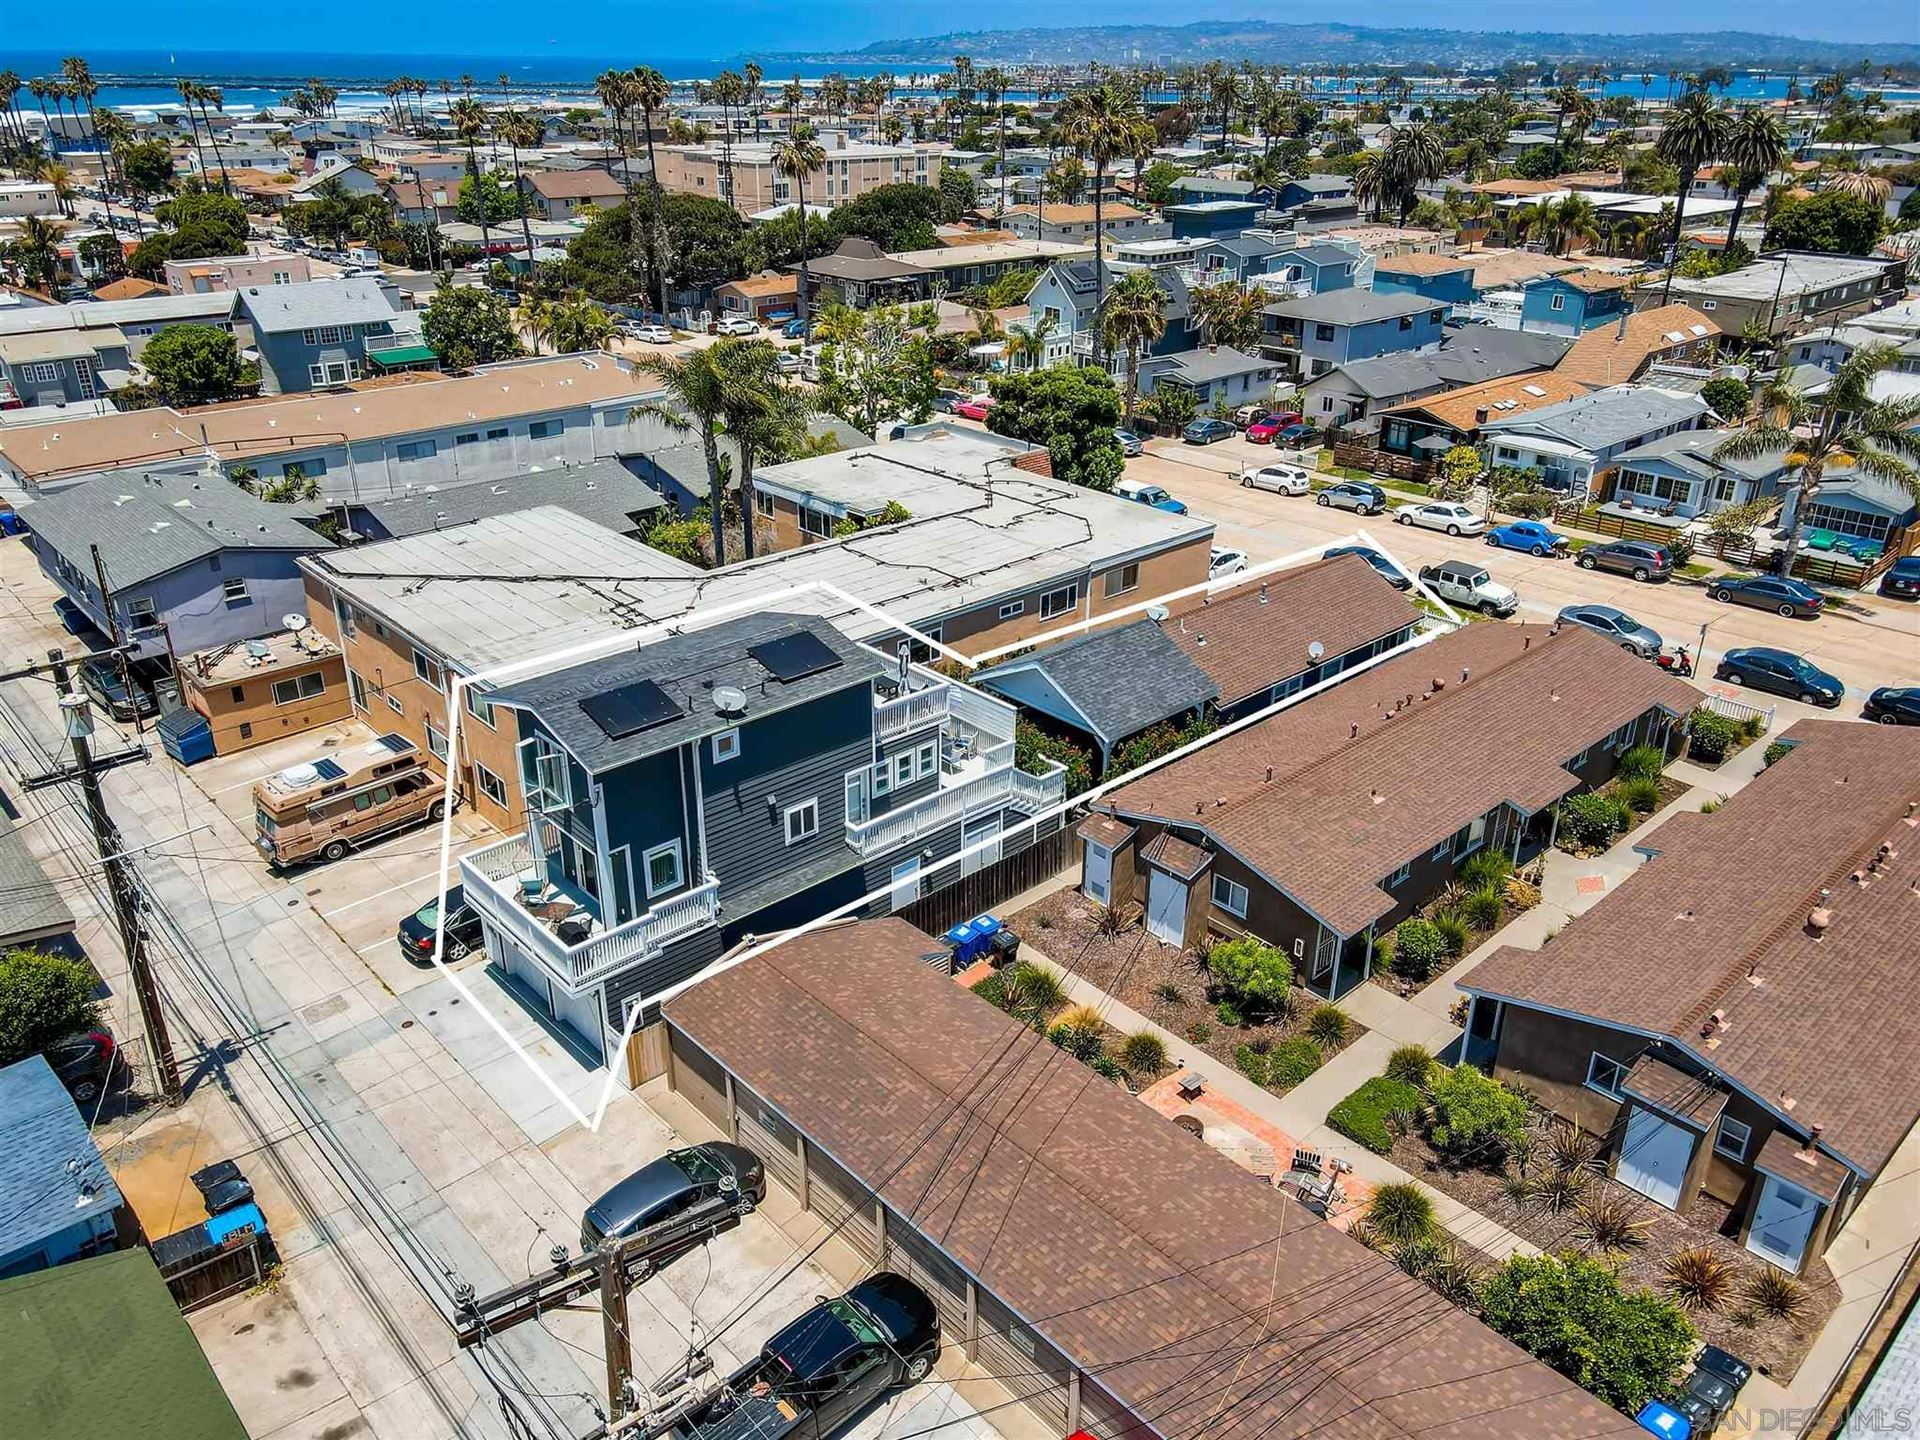 Photo of 4925-27 Saratoga Avenue, San Diego, CA 92107 (MLS # 210015787)